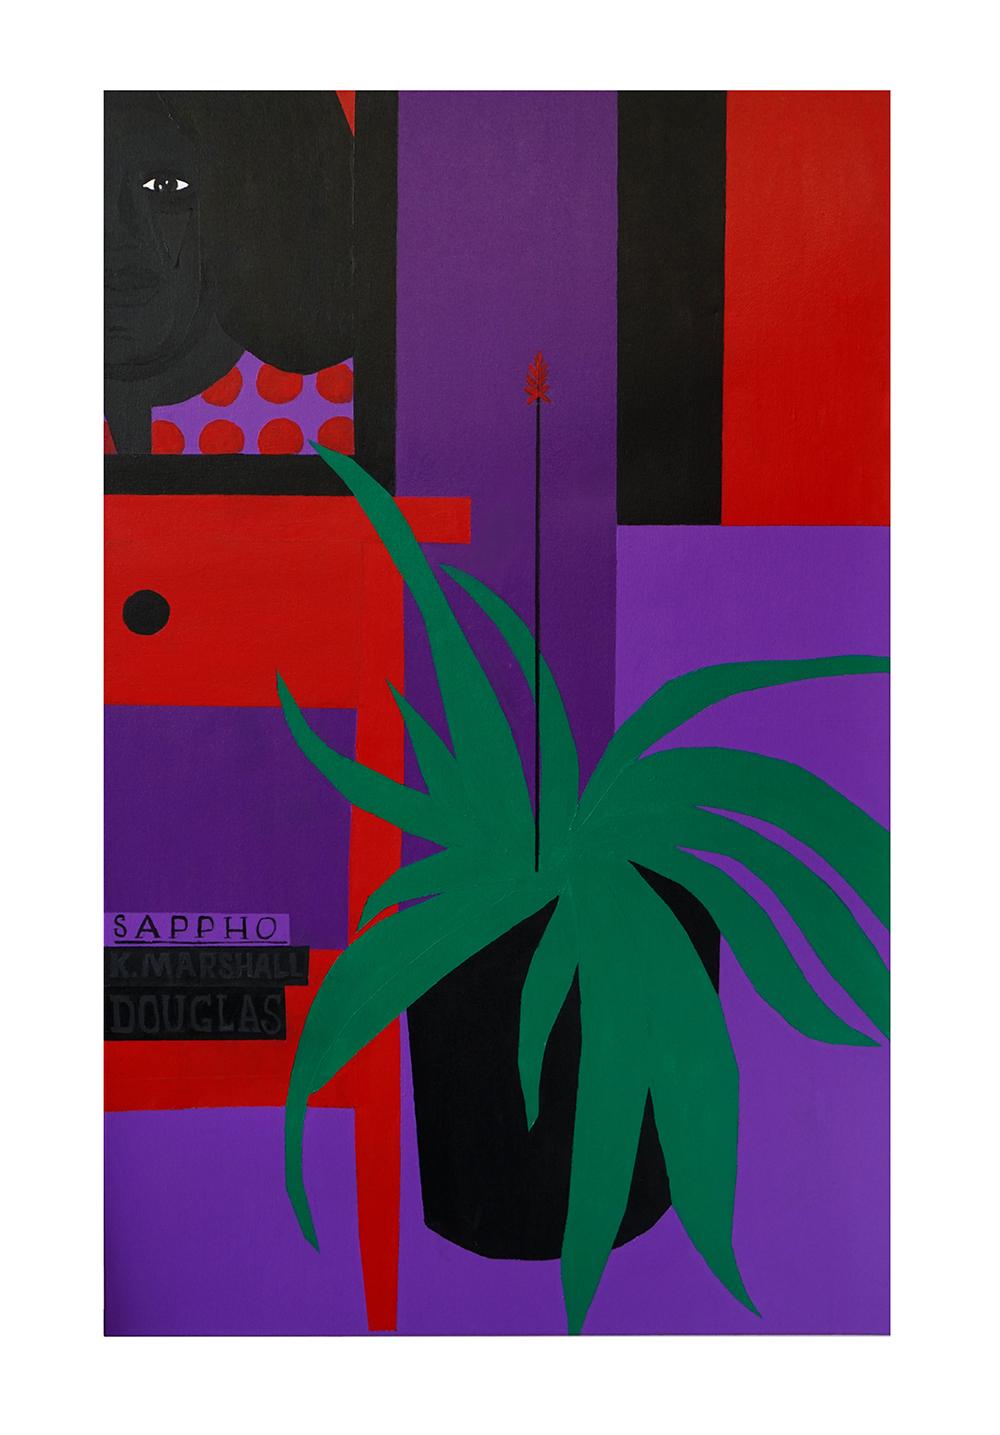 Jon Key. <em>Still Life No. 5 (Mom and Books)</em>, 2020. Acrylic on panel, 36 x 24 inches (91.4 x 61 cm)